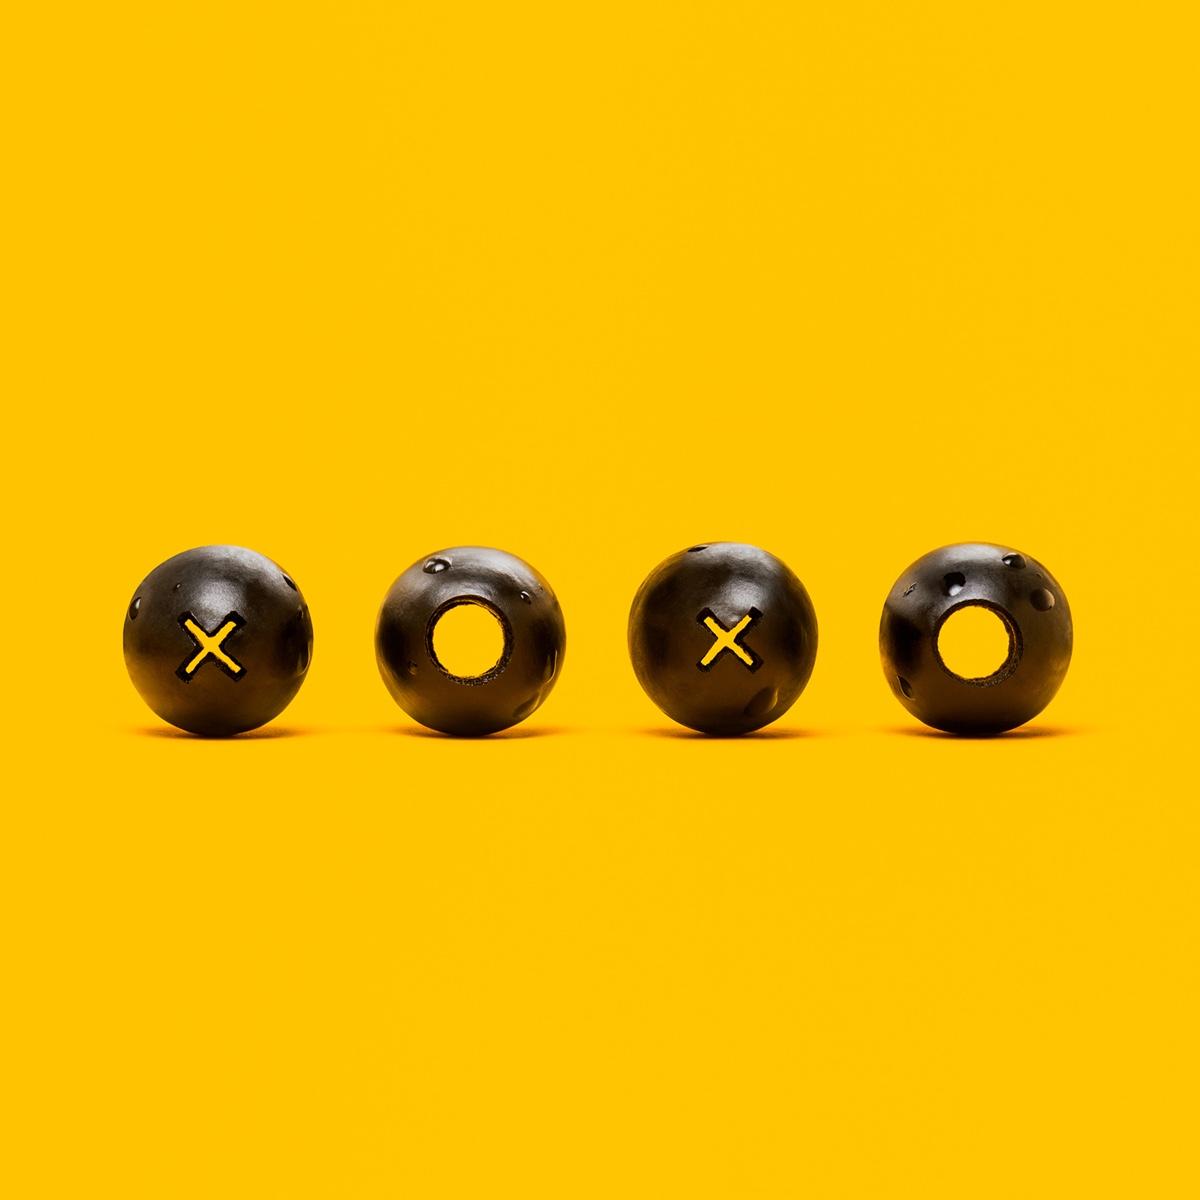 Subway赛百味巧克力海报